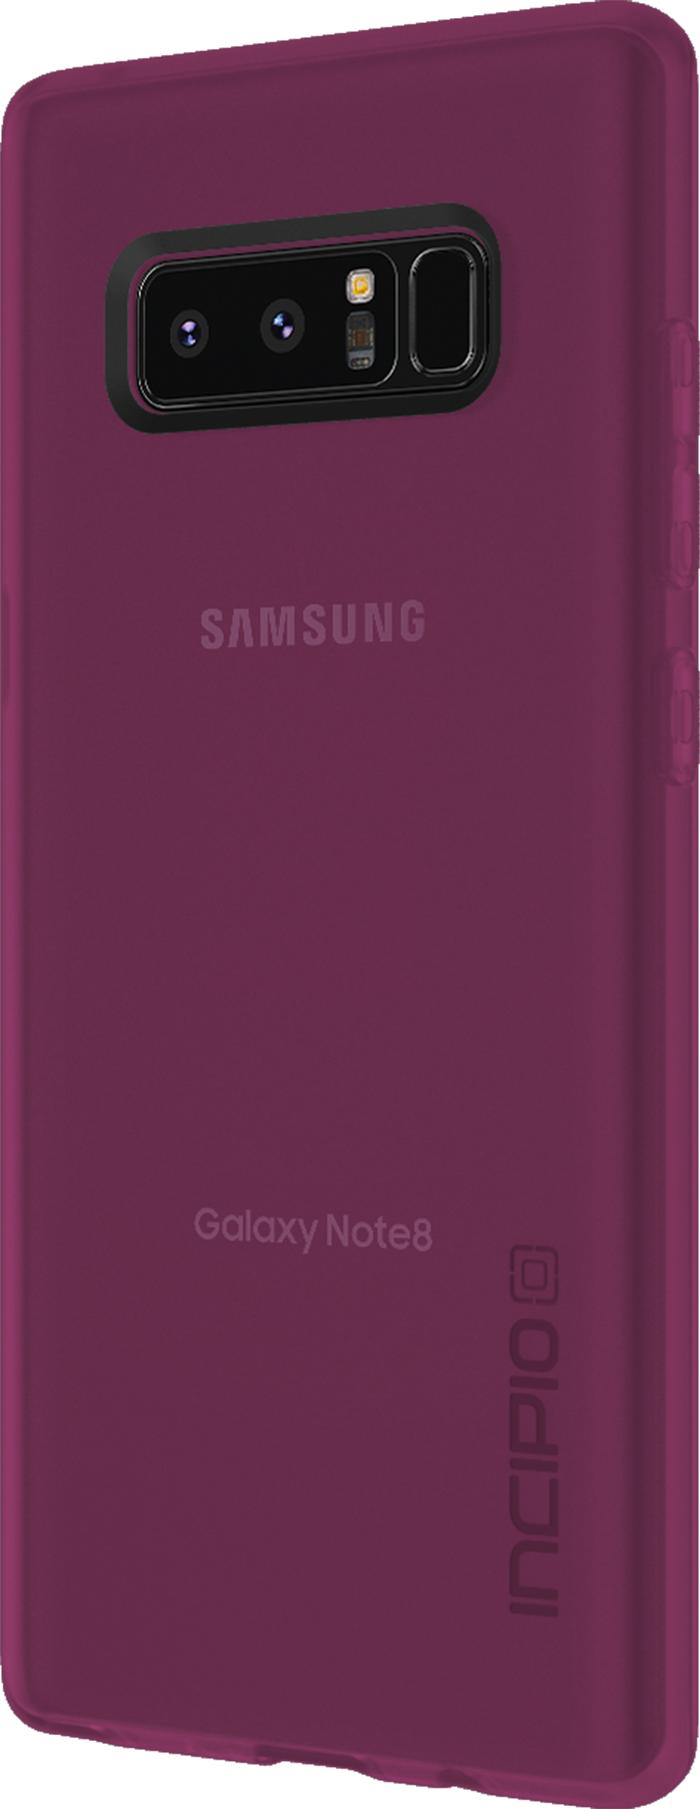 Galaxy Note8 NGP Case